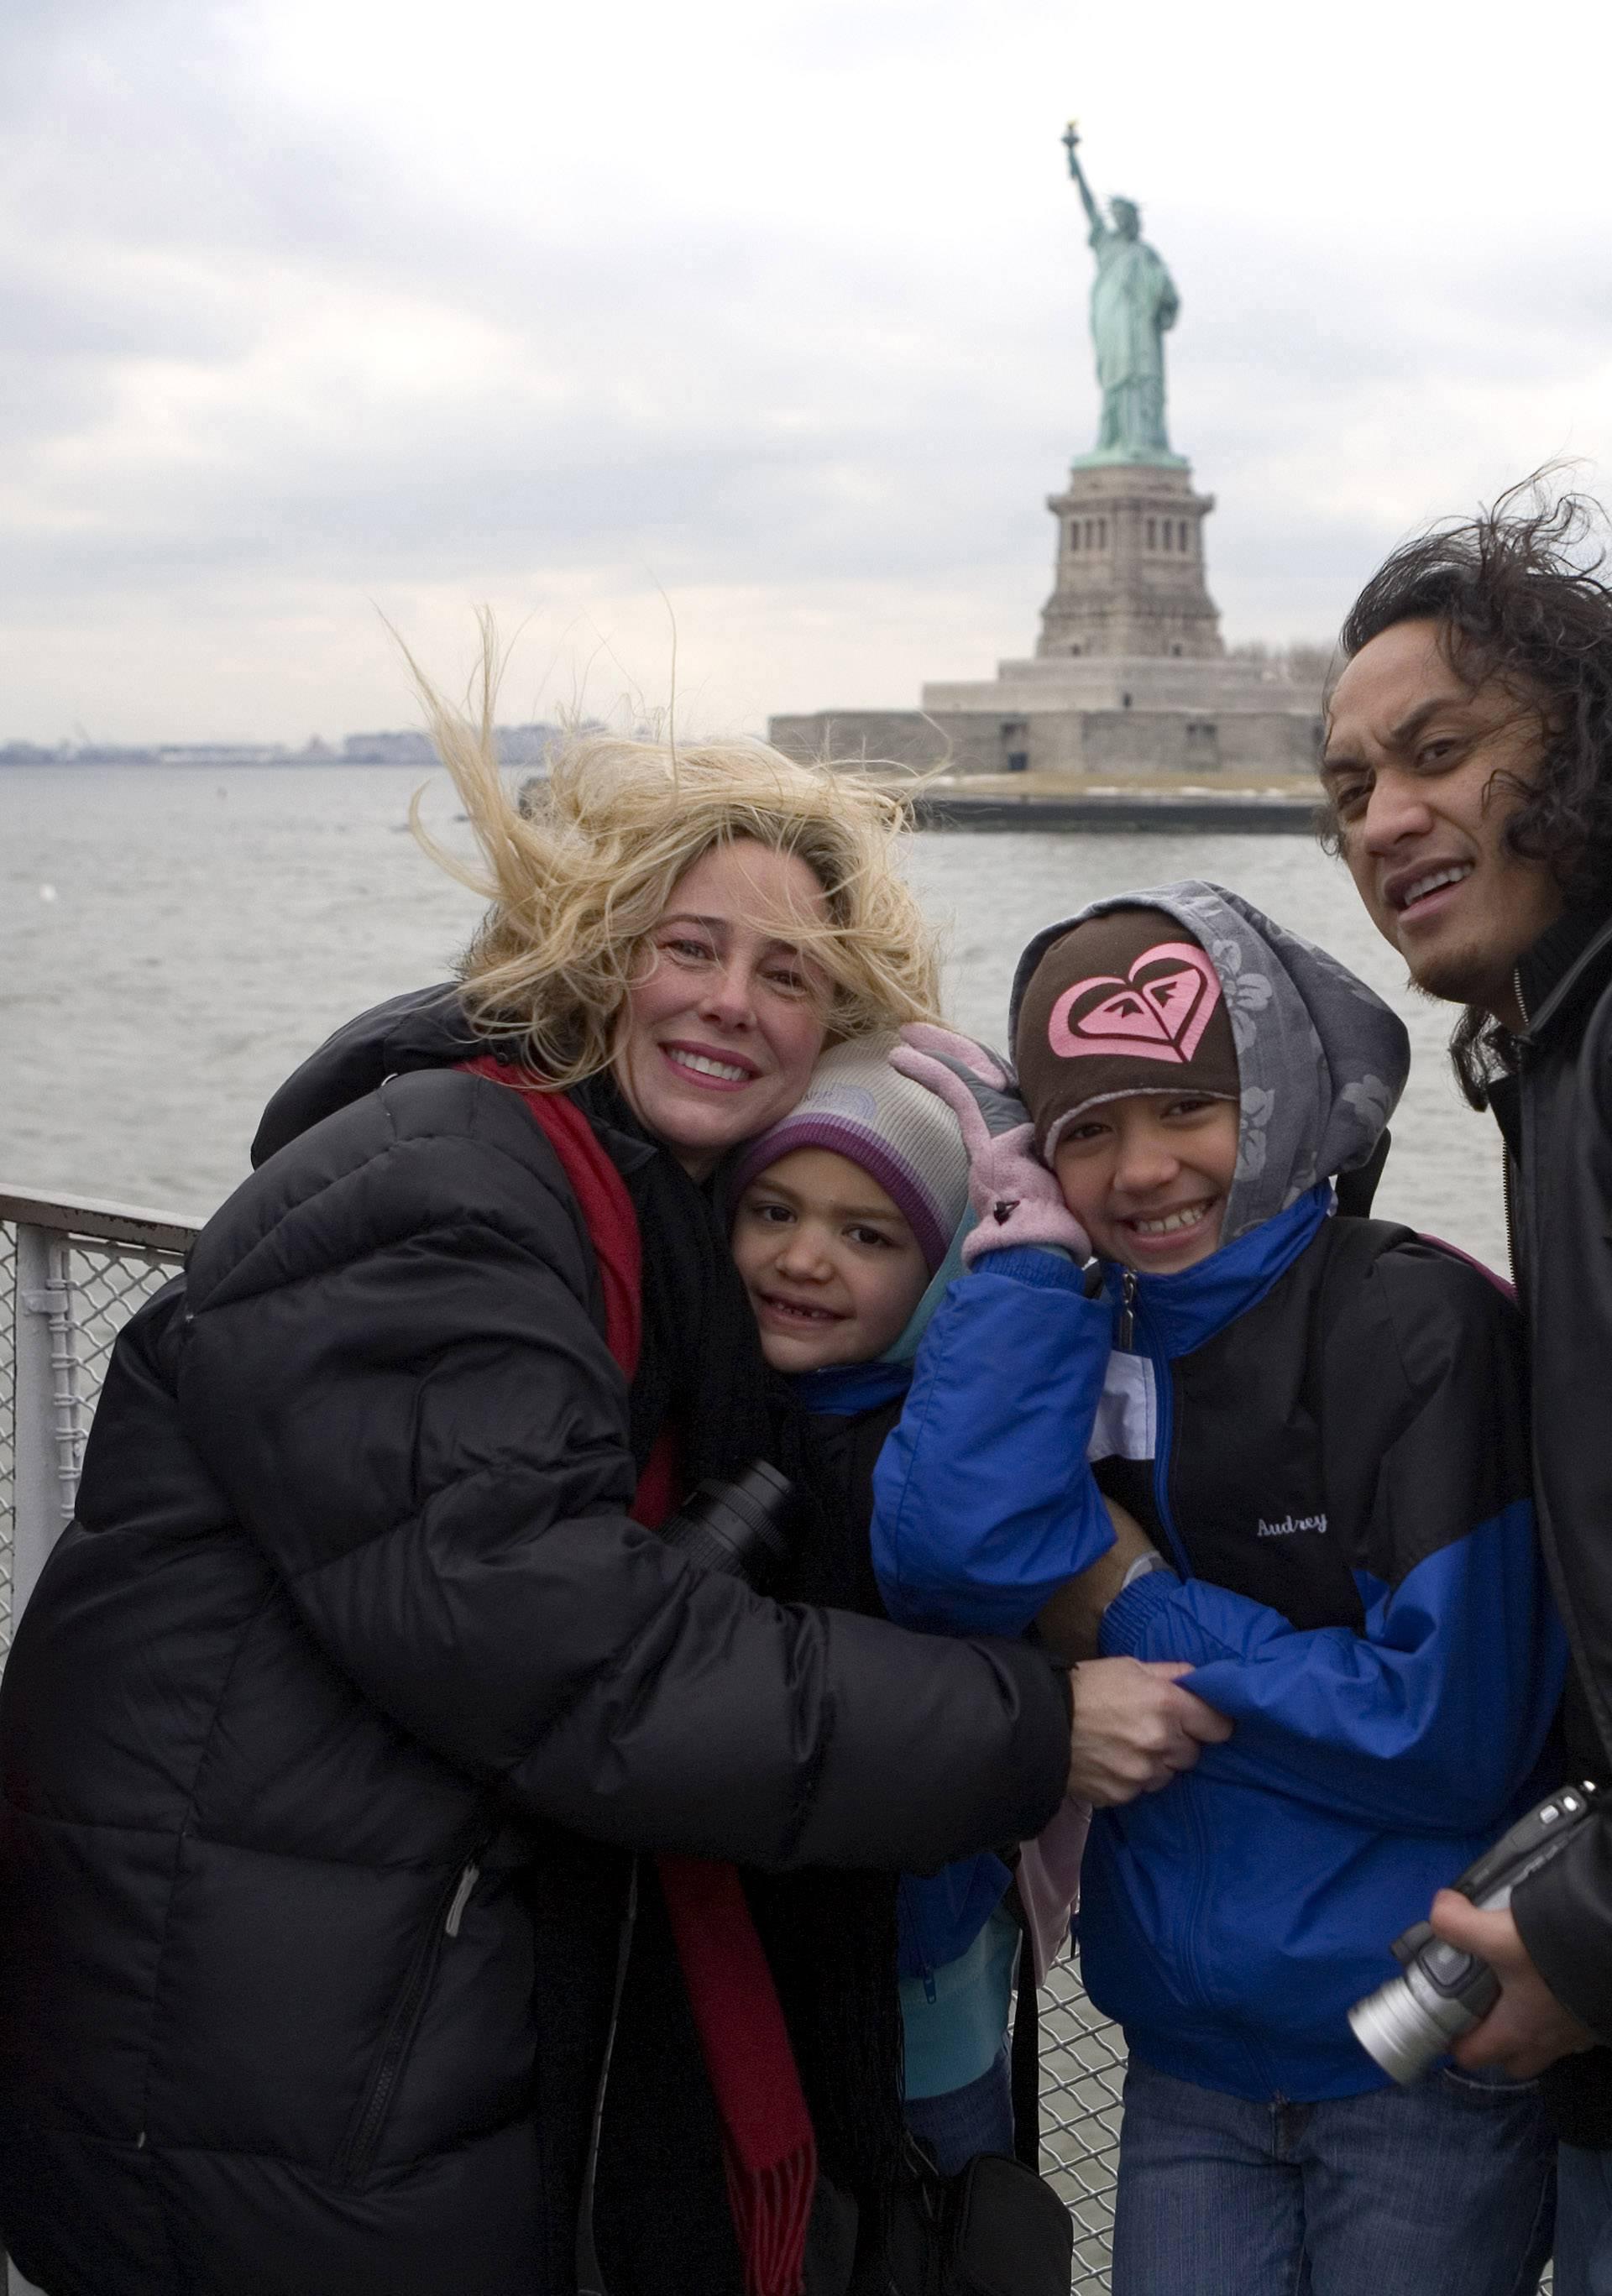 Mary Kay Letourneau with husband Vili Fualaau and children Audrey and Georgia